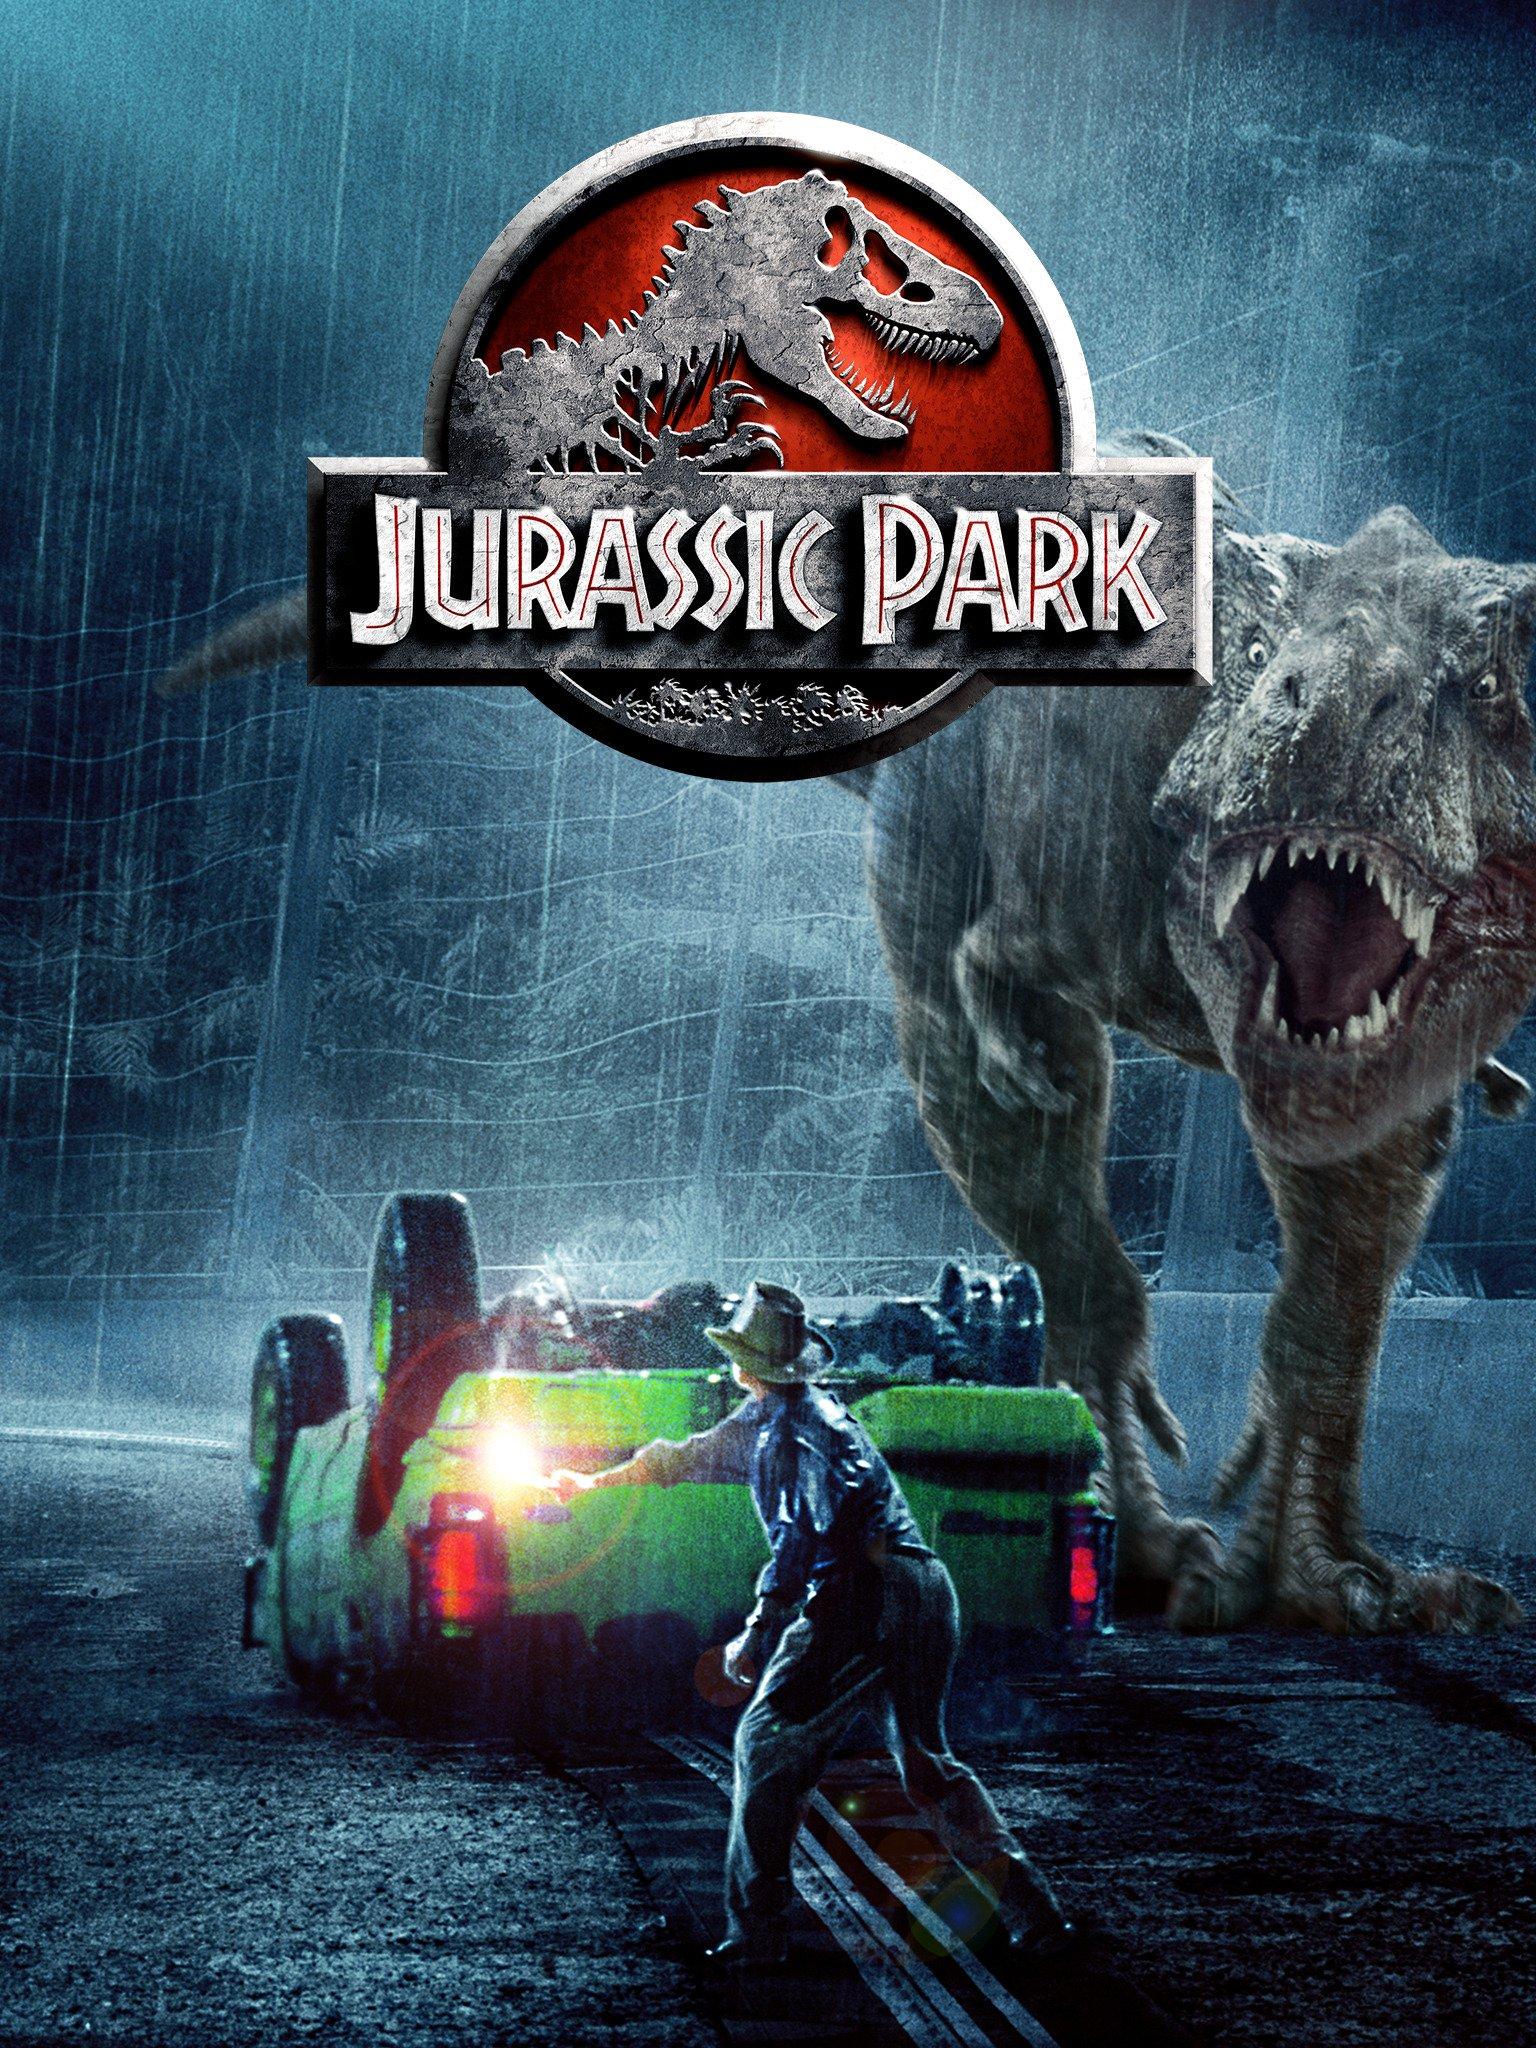 Watch Jurassic Park Prime Video 1 Studio Tyrannosaurus Rex 1993 15